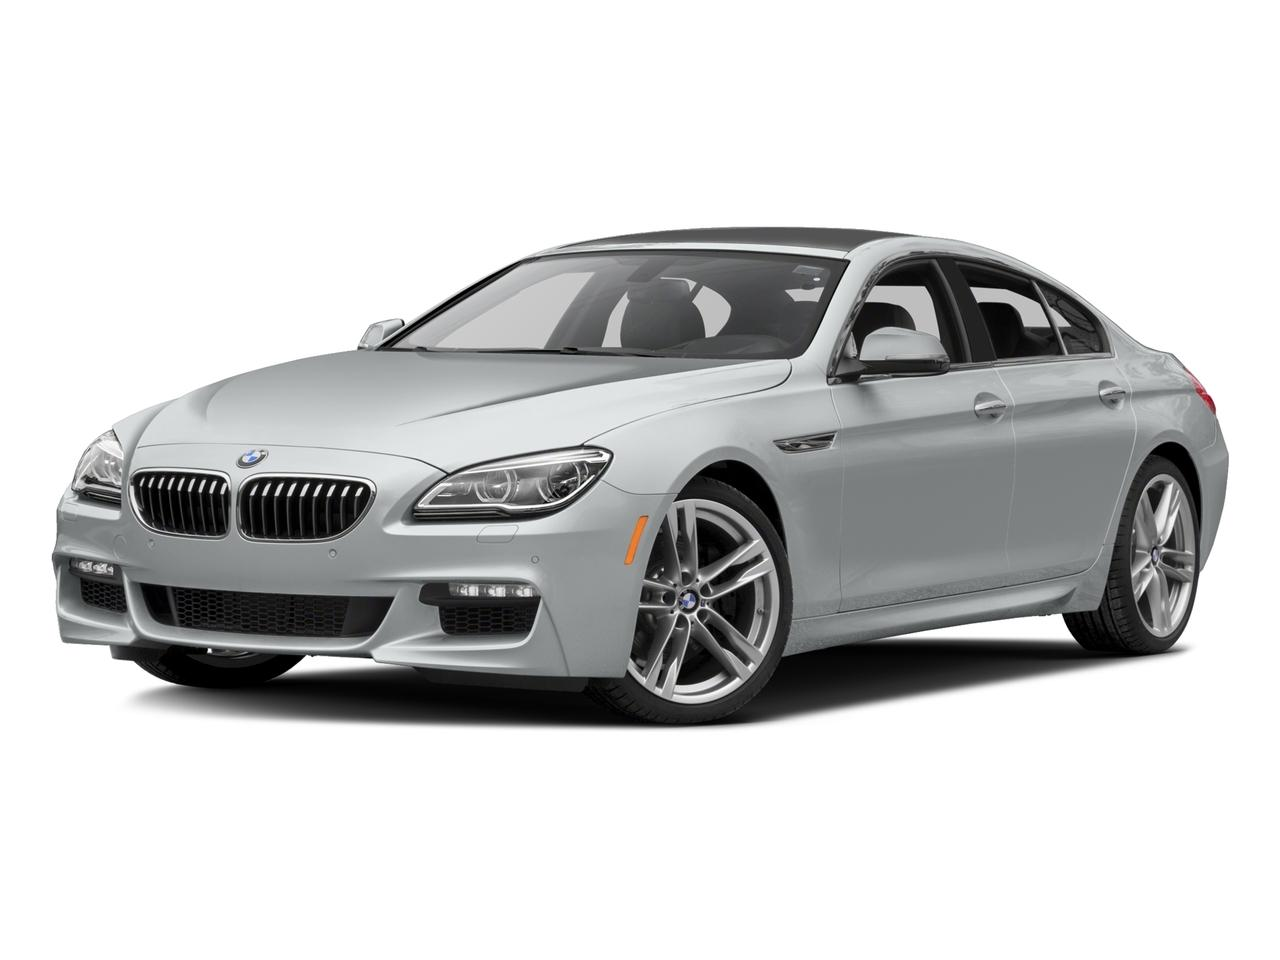 2016 BMW 640i Vehicle Photo in Houston, TX 77054